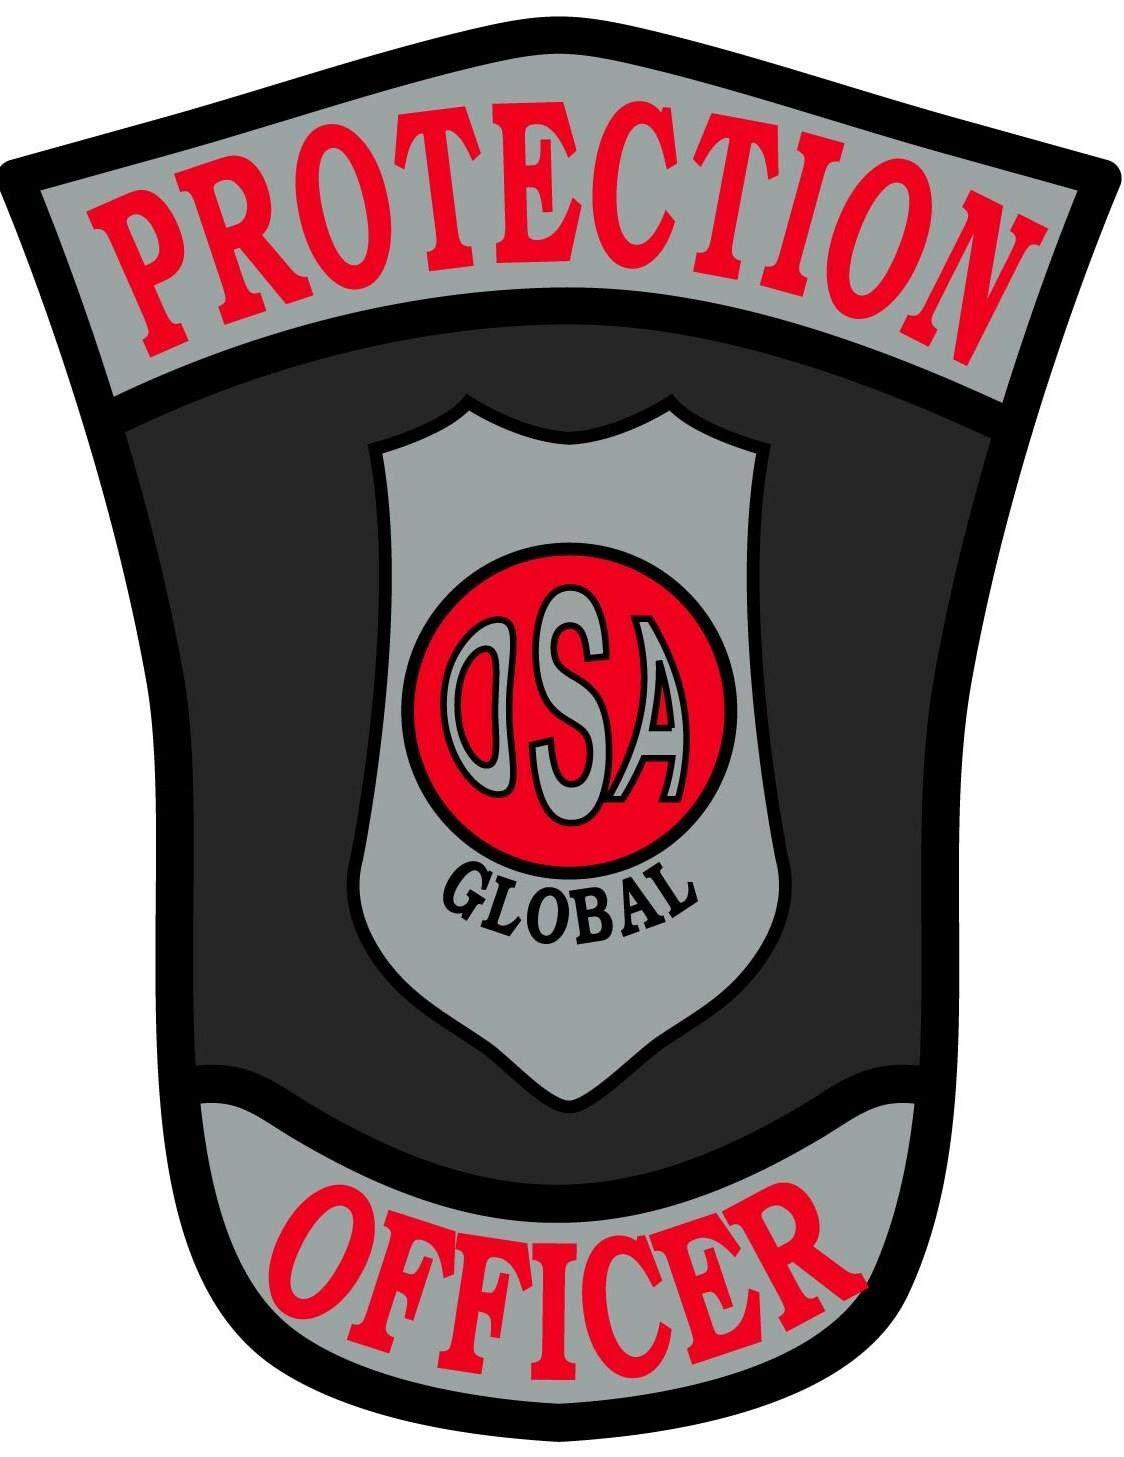 OSA Global, LLC